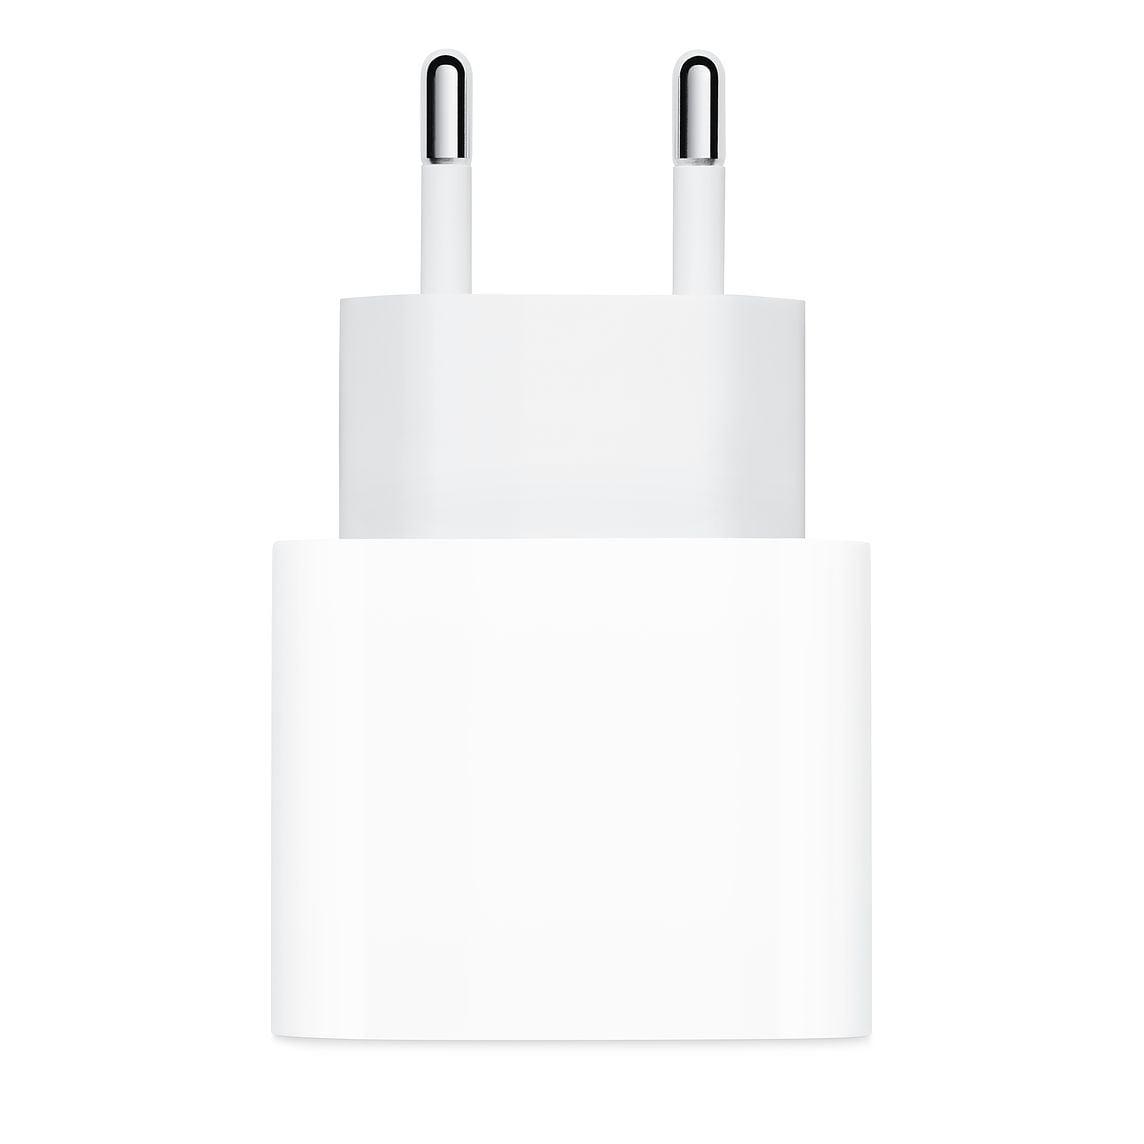 Incarcator retea original Apple, MU7V2ZM/A, Retail Box, Quick Charge 18W, USB-C, White